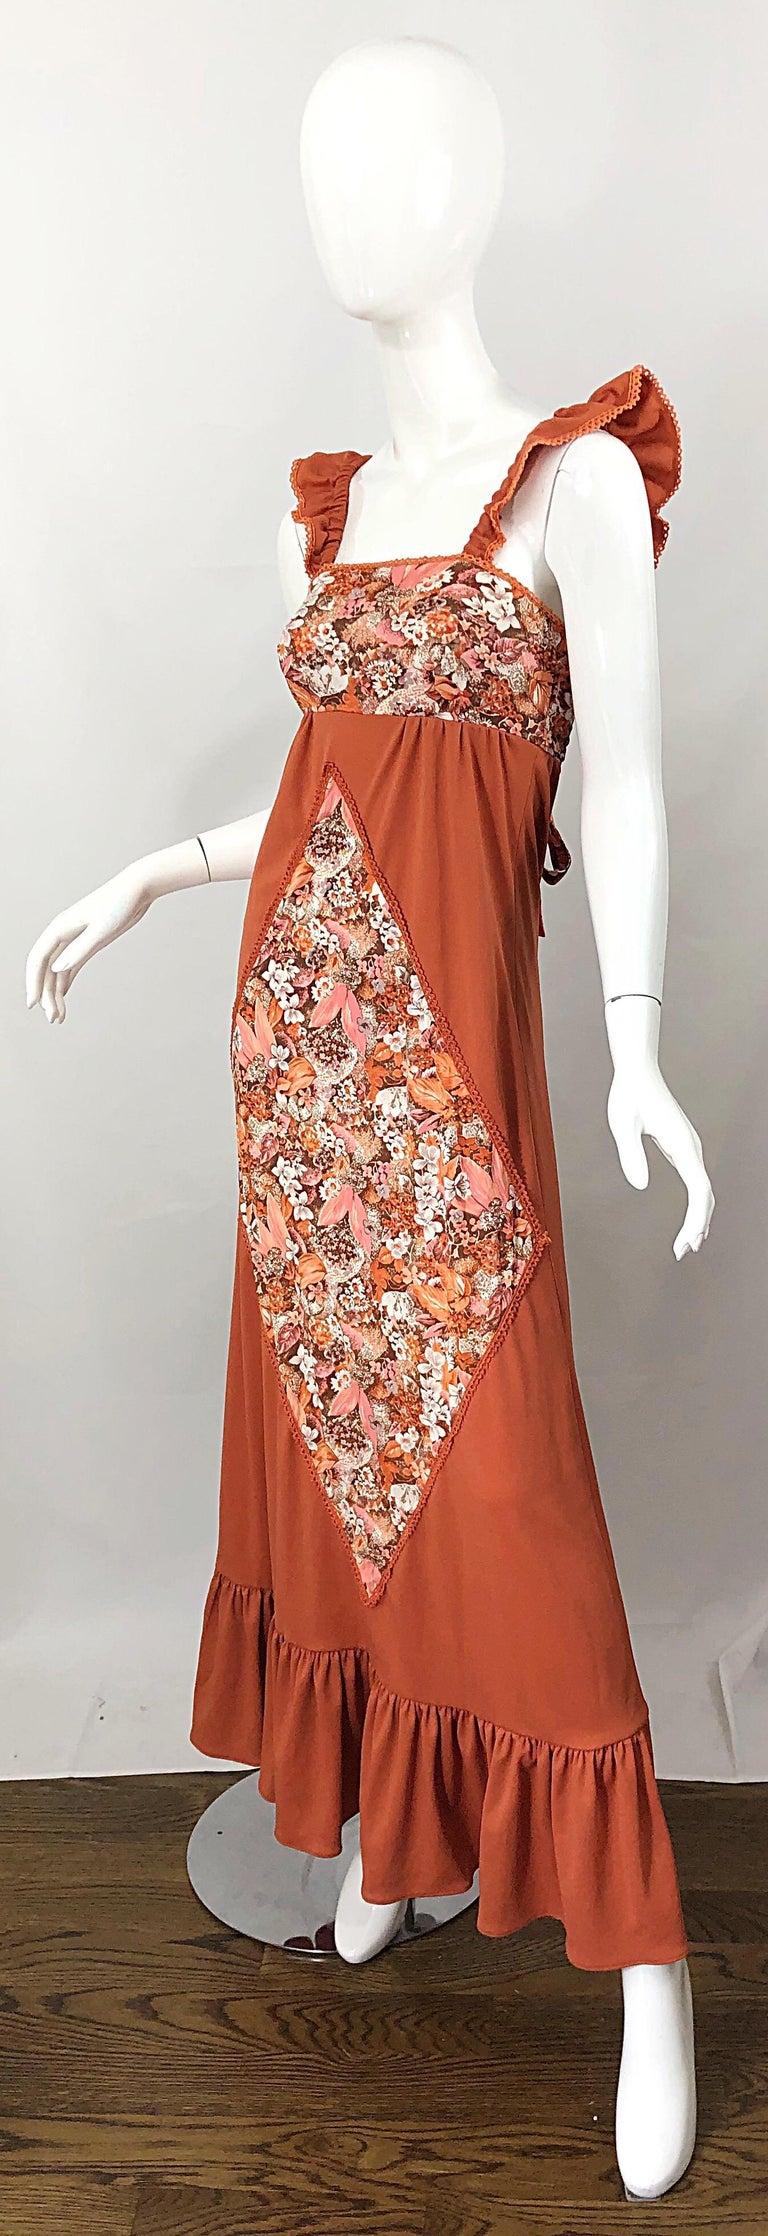 1970s Burnt Orange Patchwork Flowers Boho Vintage 70s Jersey Autumnal Maxi Dress For Sale 5